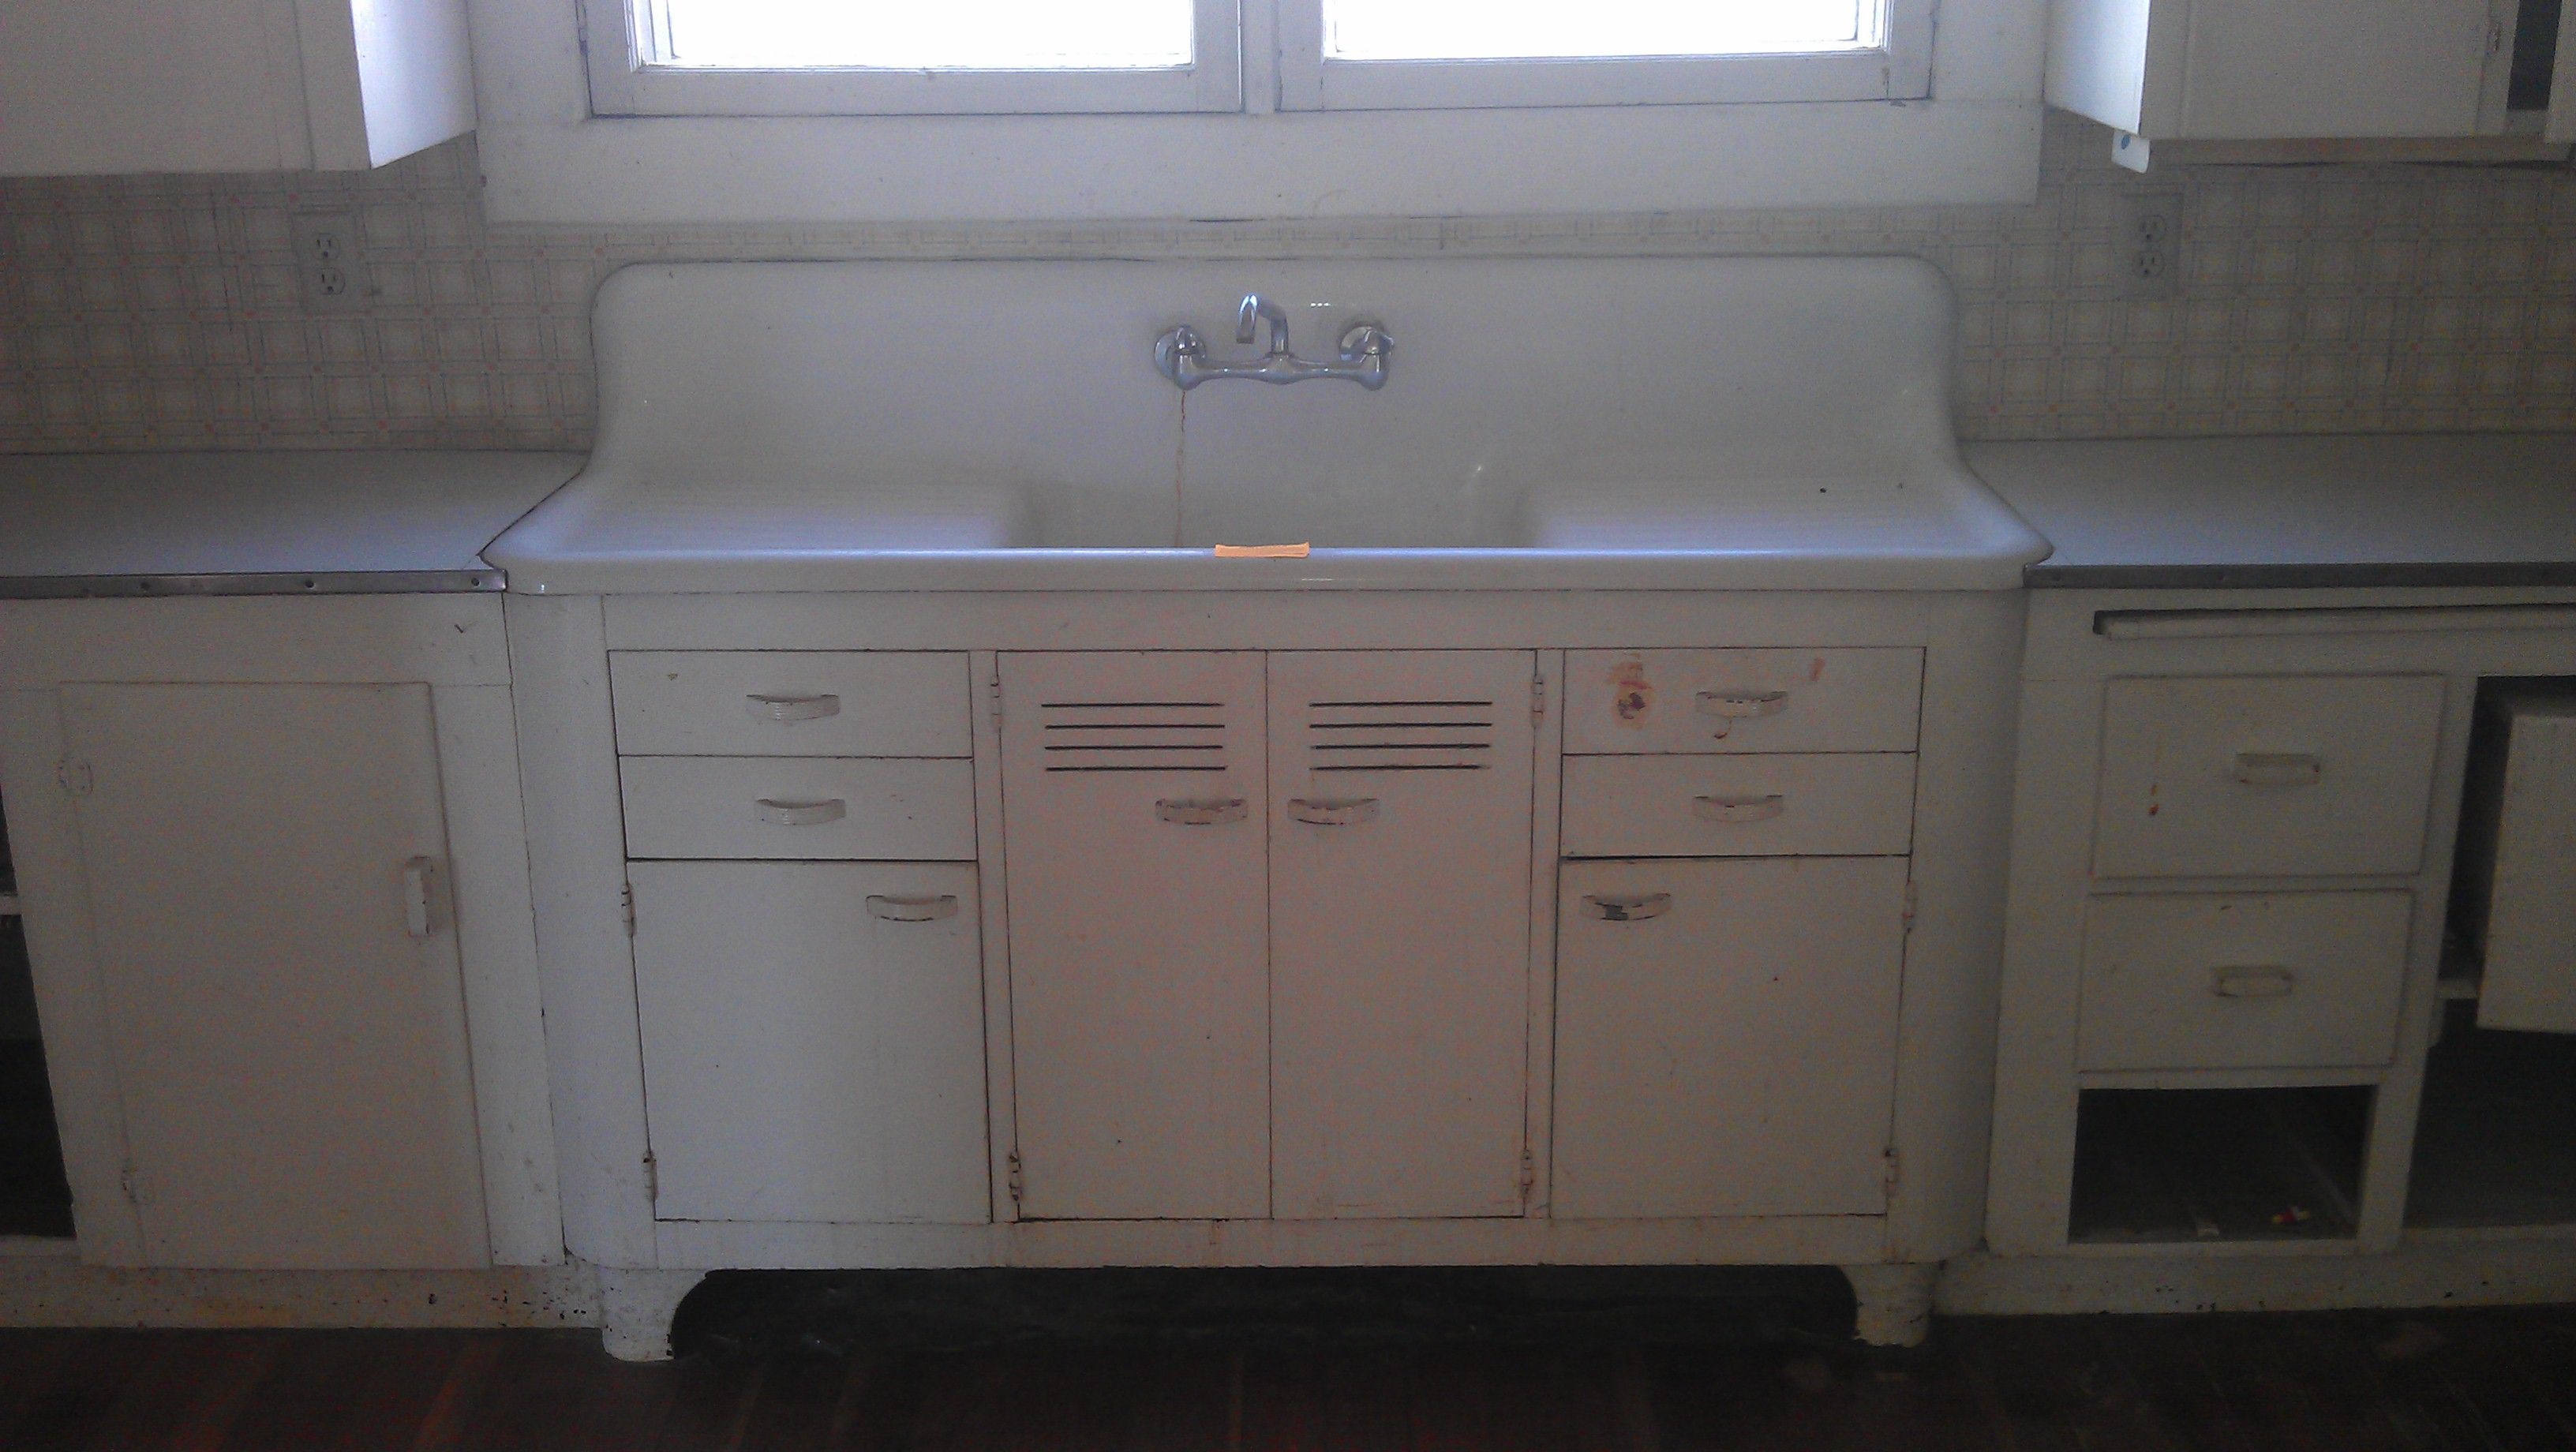 farmhouse kitchen faucet Kitchen Vintage Single Basin Double Drainboard Kitchen Sink Vintage Kitchen Sinks Antique Retro Kitchen Faucets and Sinks Ideas For New Vint